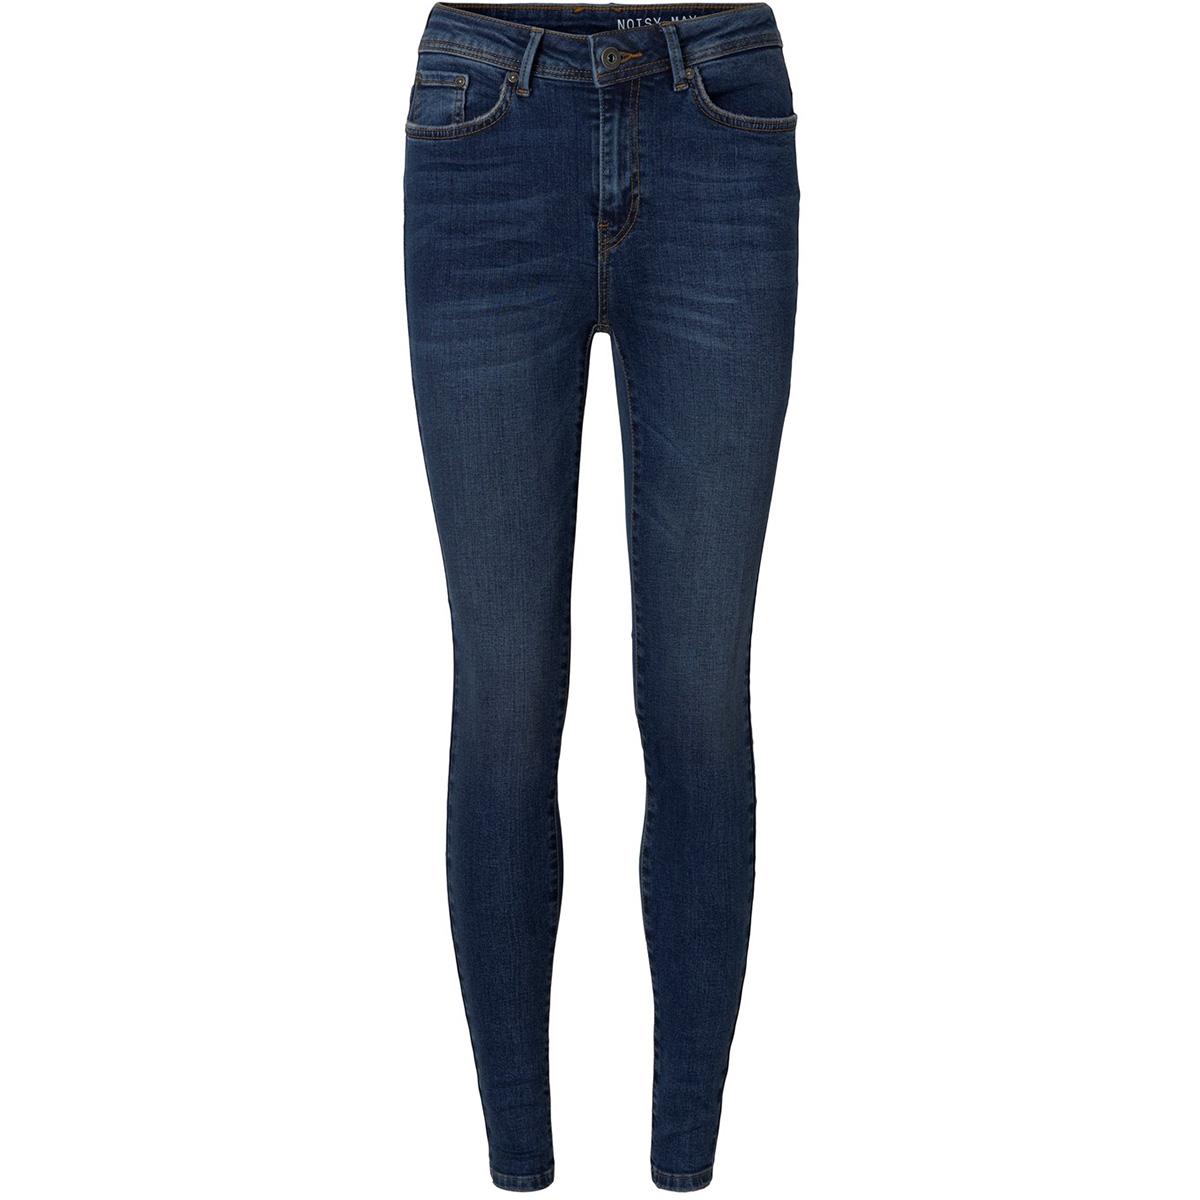 nmvicky nw skinny jeans ba054 db noos 27008741 noisy may jeans dark blue denim